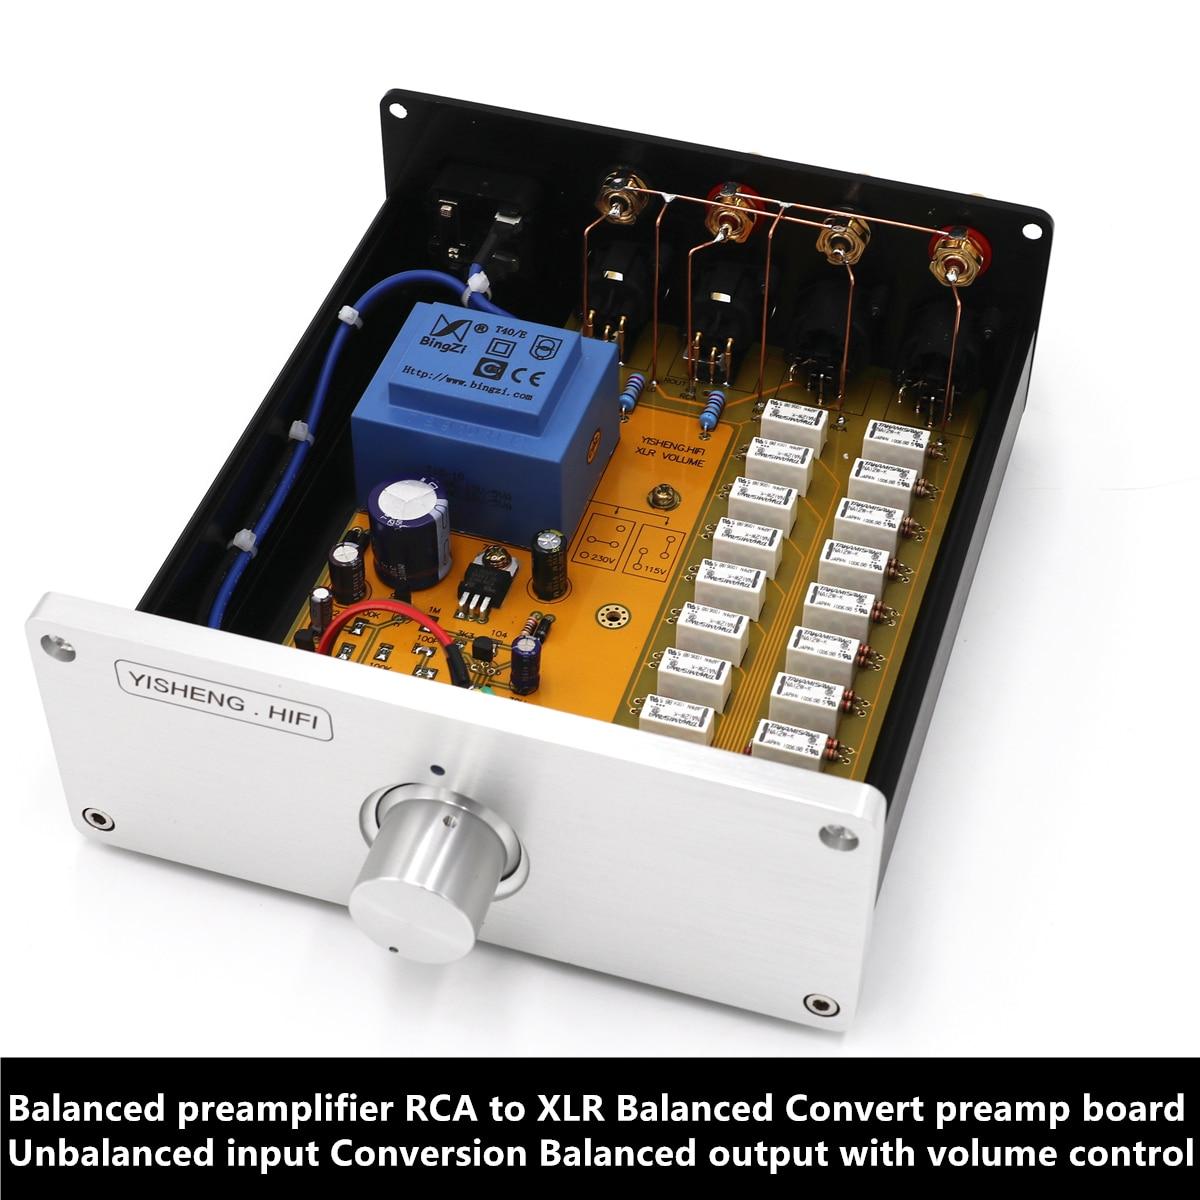 Balanced preamplifier RCA to XLR Balanced Convert preamp board Unbalanced input Conversion Balanced output with volume